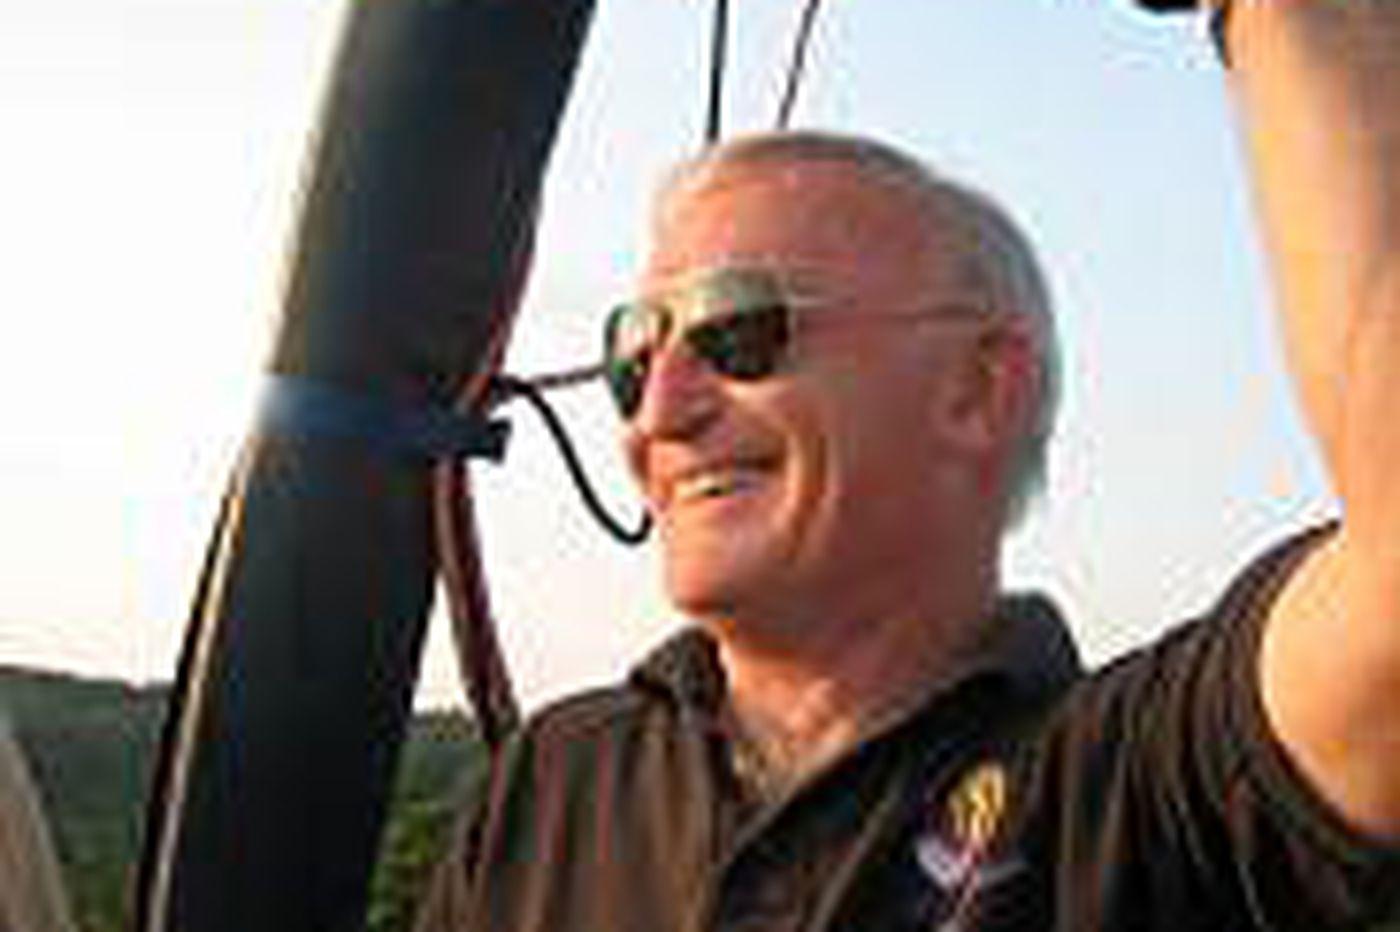 Pilot in hot air balloon crash identified